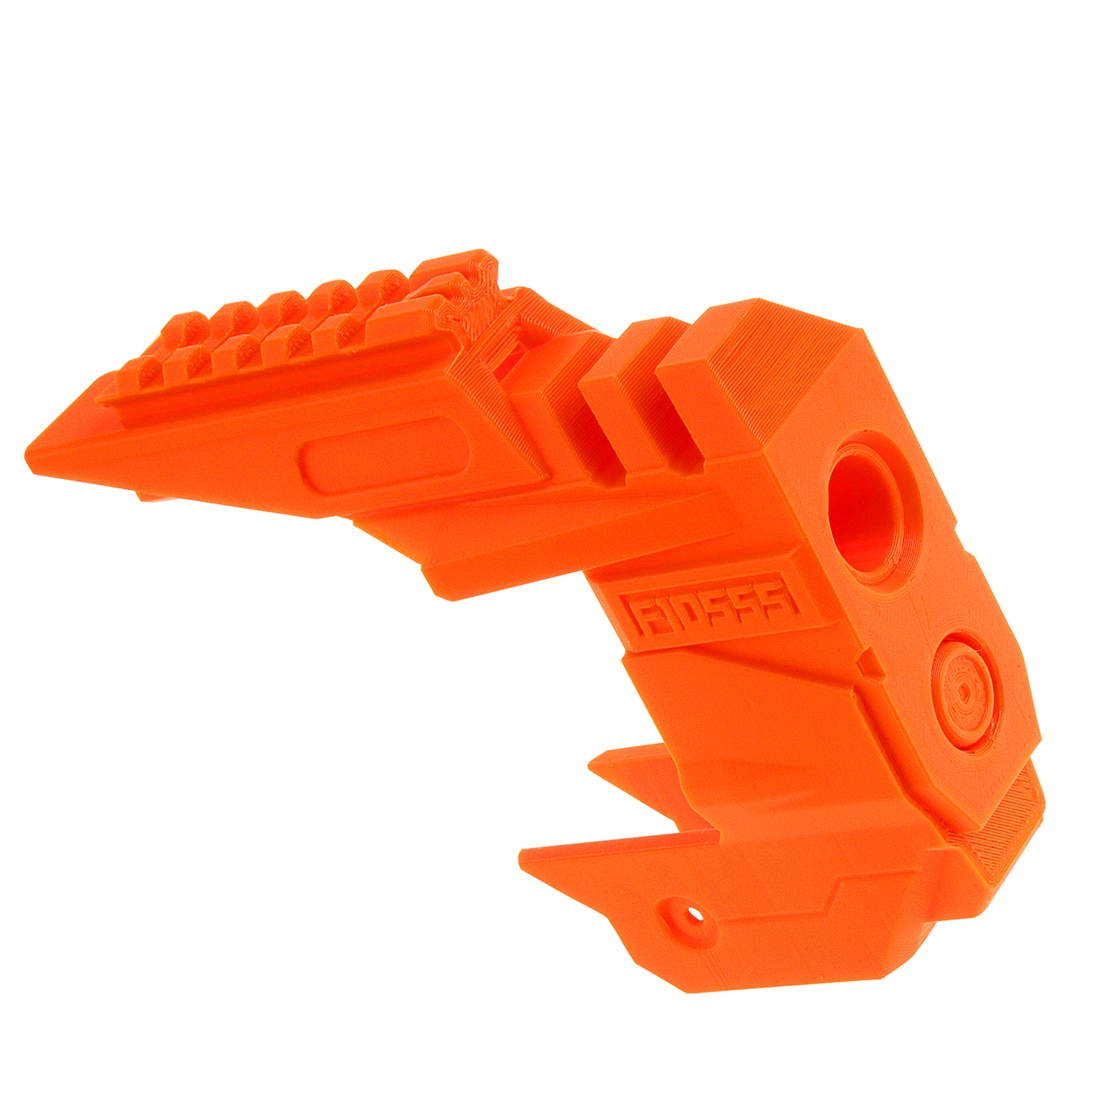 Trabajador F10555 n. ° 217 Kit de barril para NERF Zombie martillo-naranja